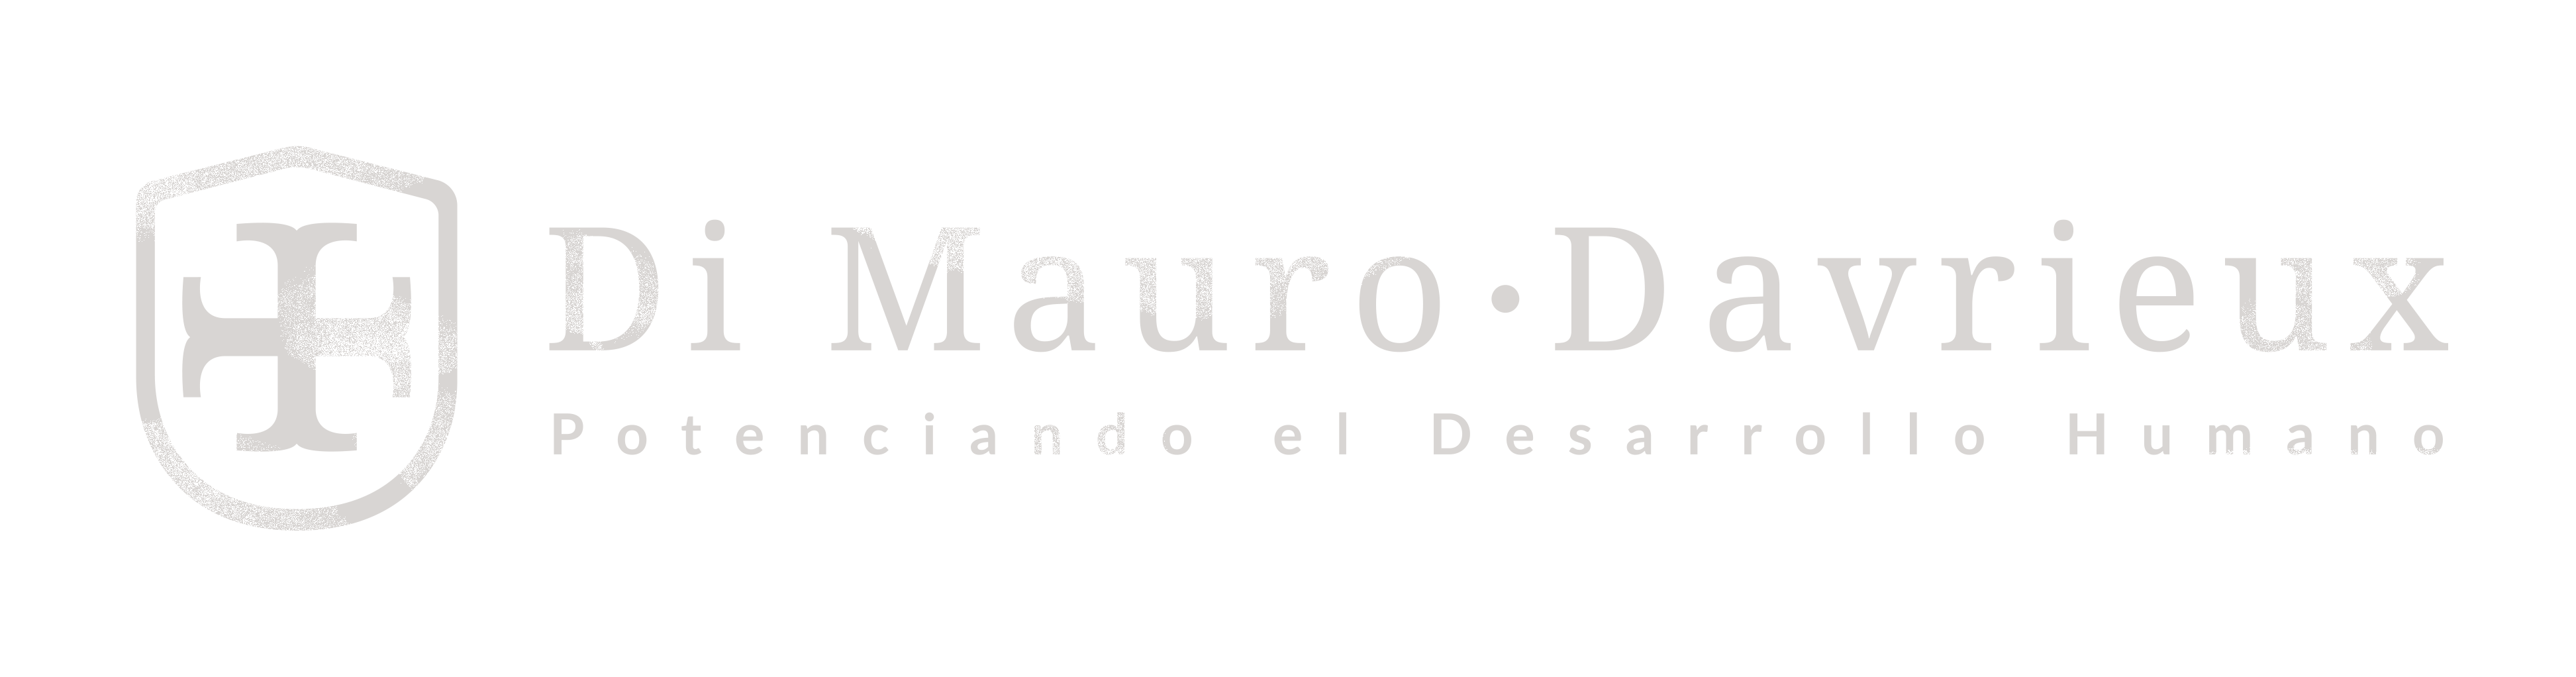 Di Mauro Davrieux